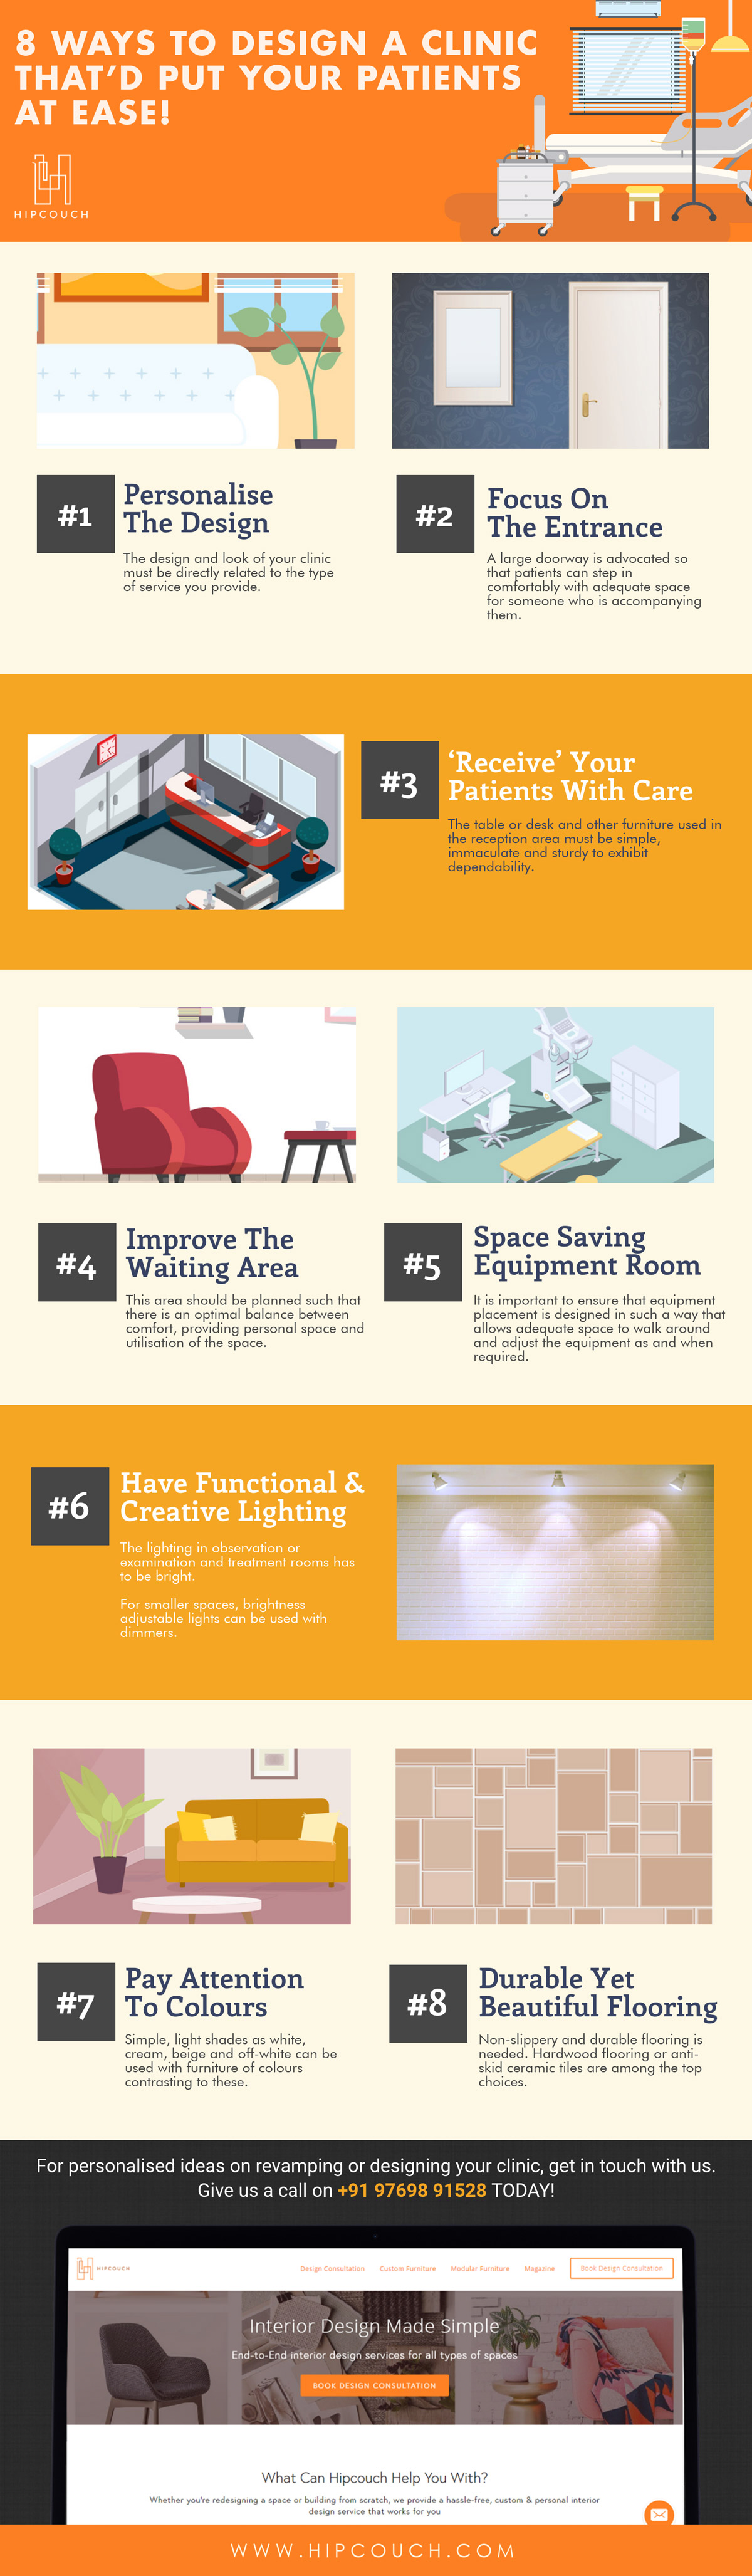 Tips-for-Clinic-Interior-Designs.jpg